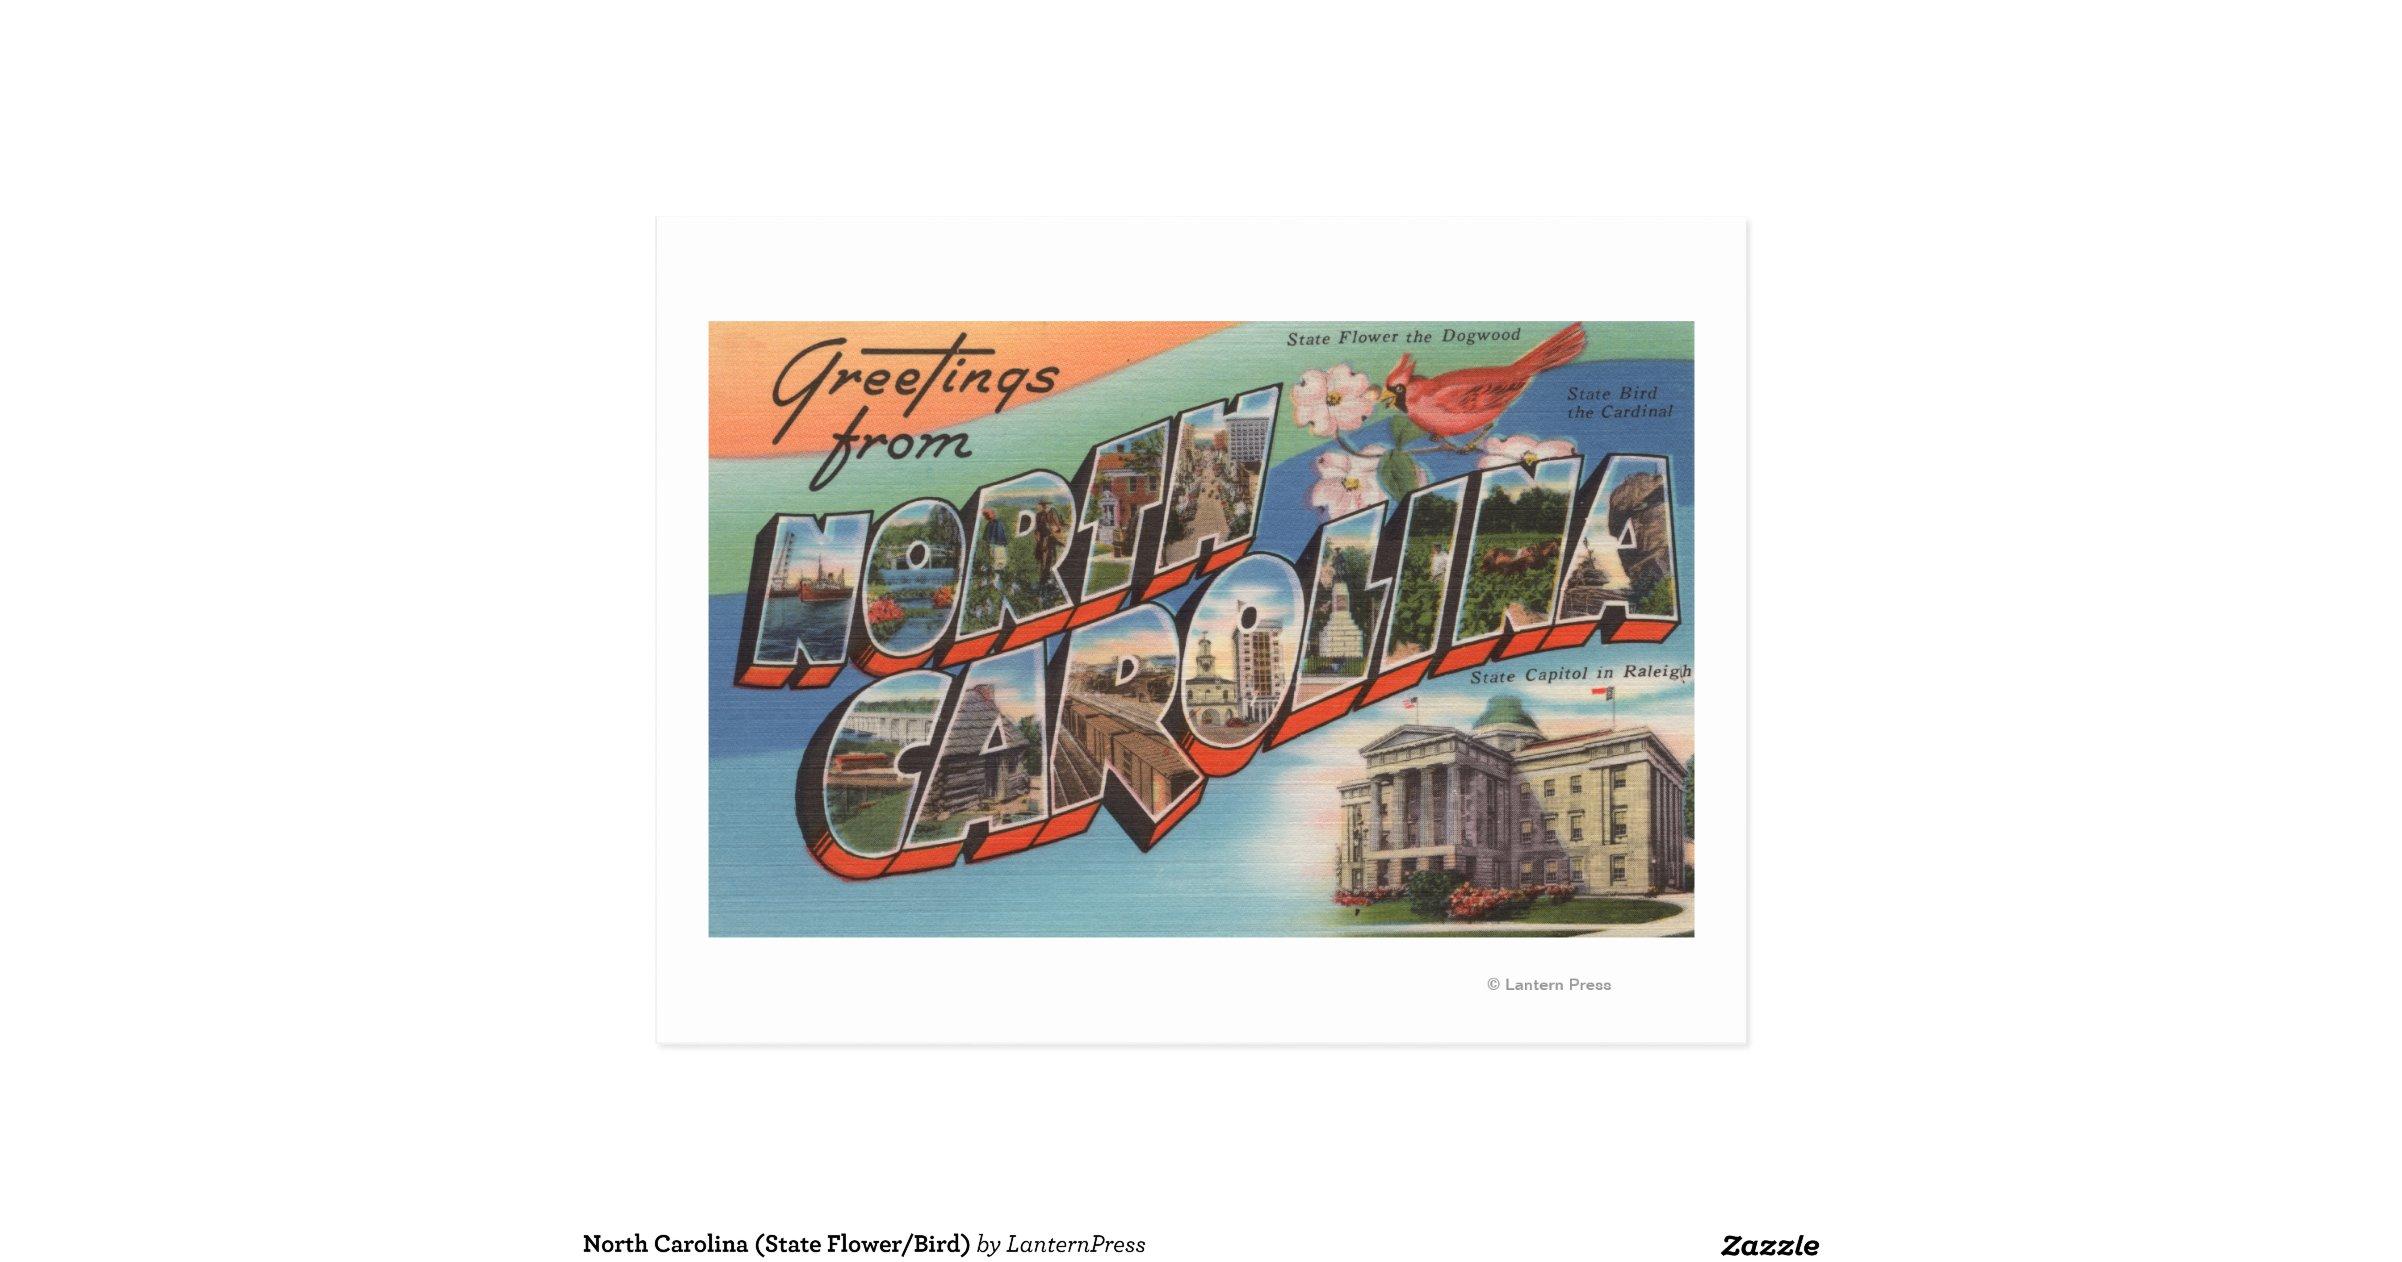 north carolina state flower bird postcard r864e2bb baa8cddcbf1a3b4a4eb v